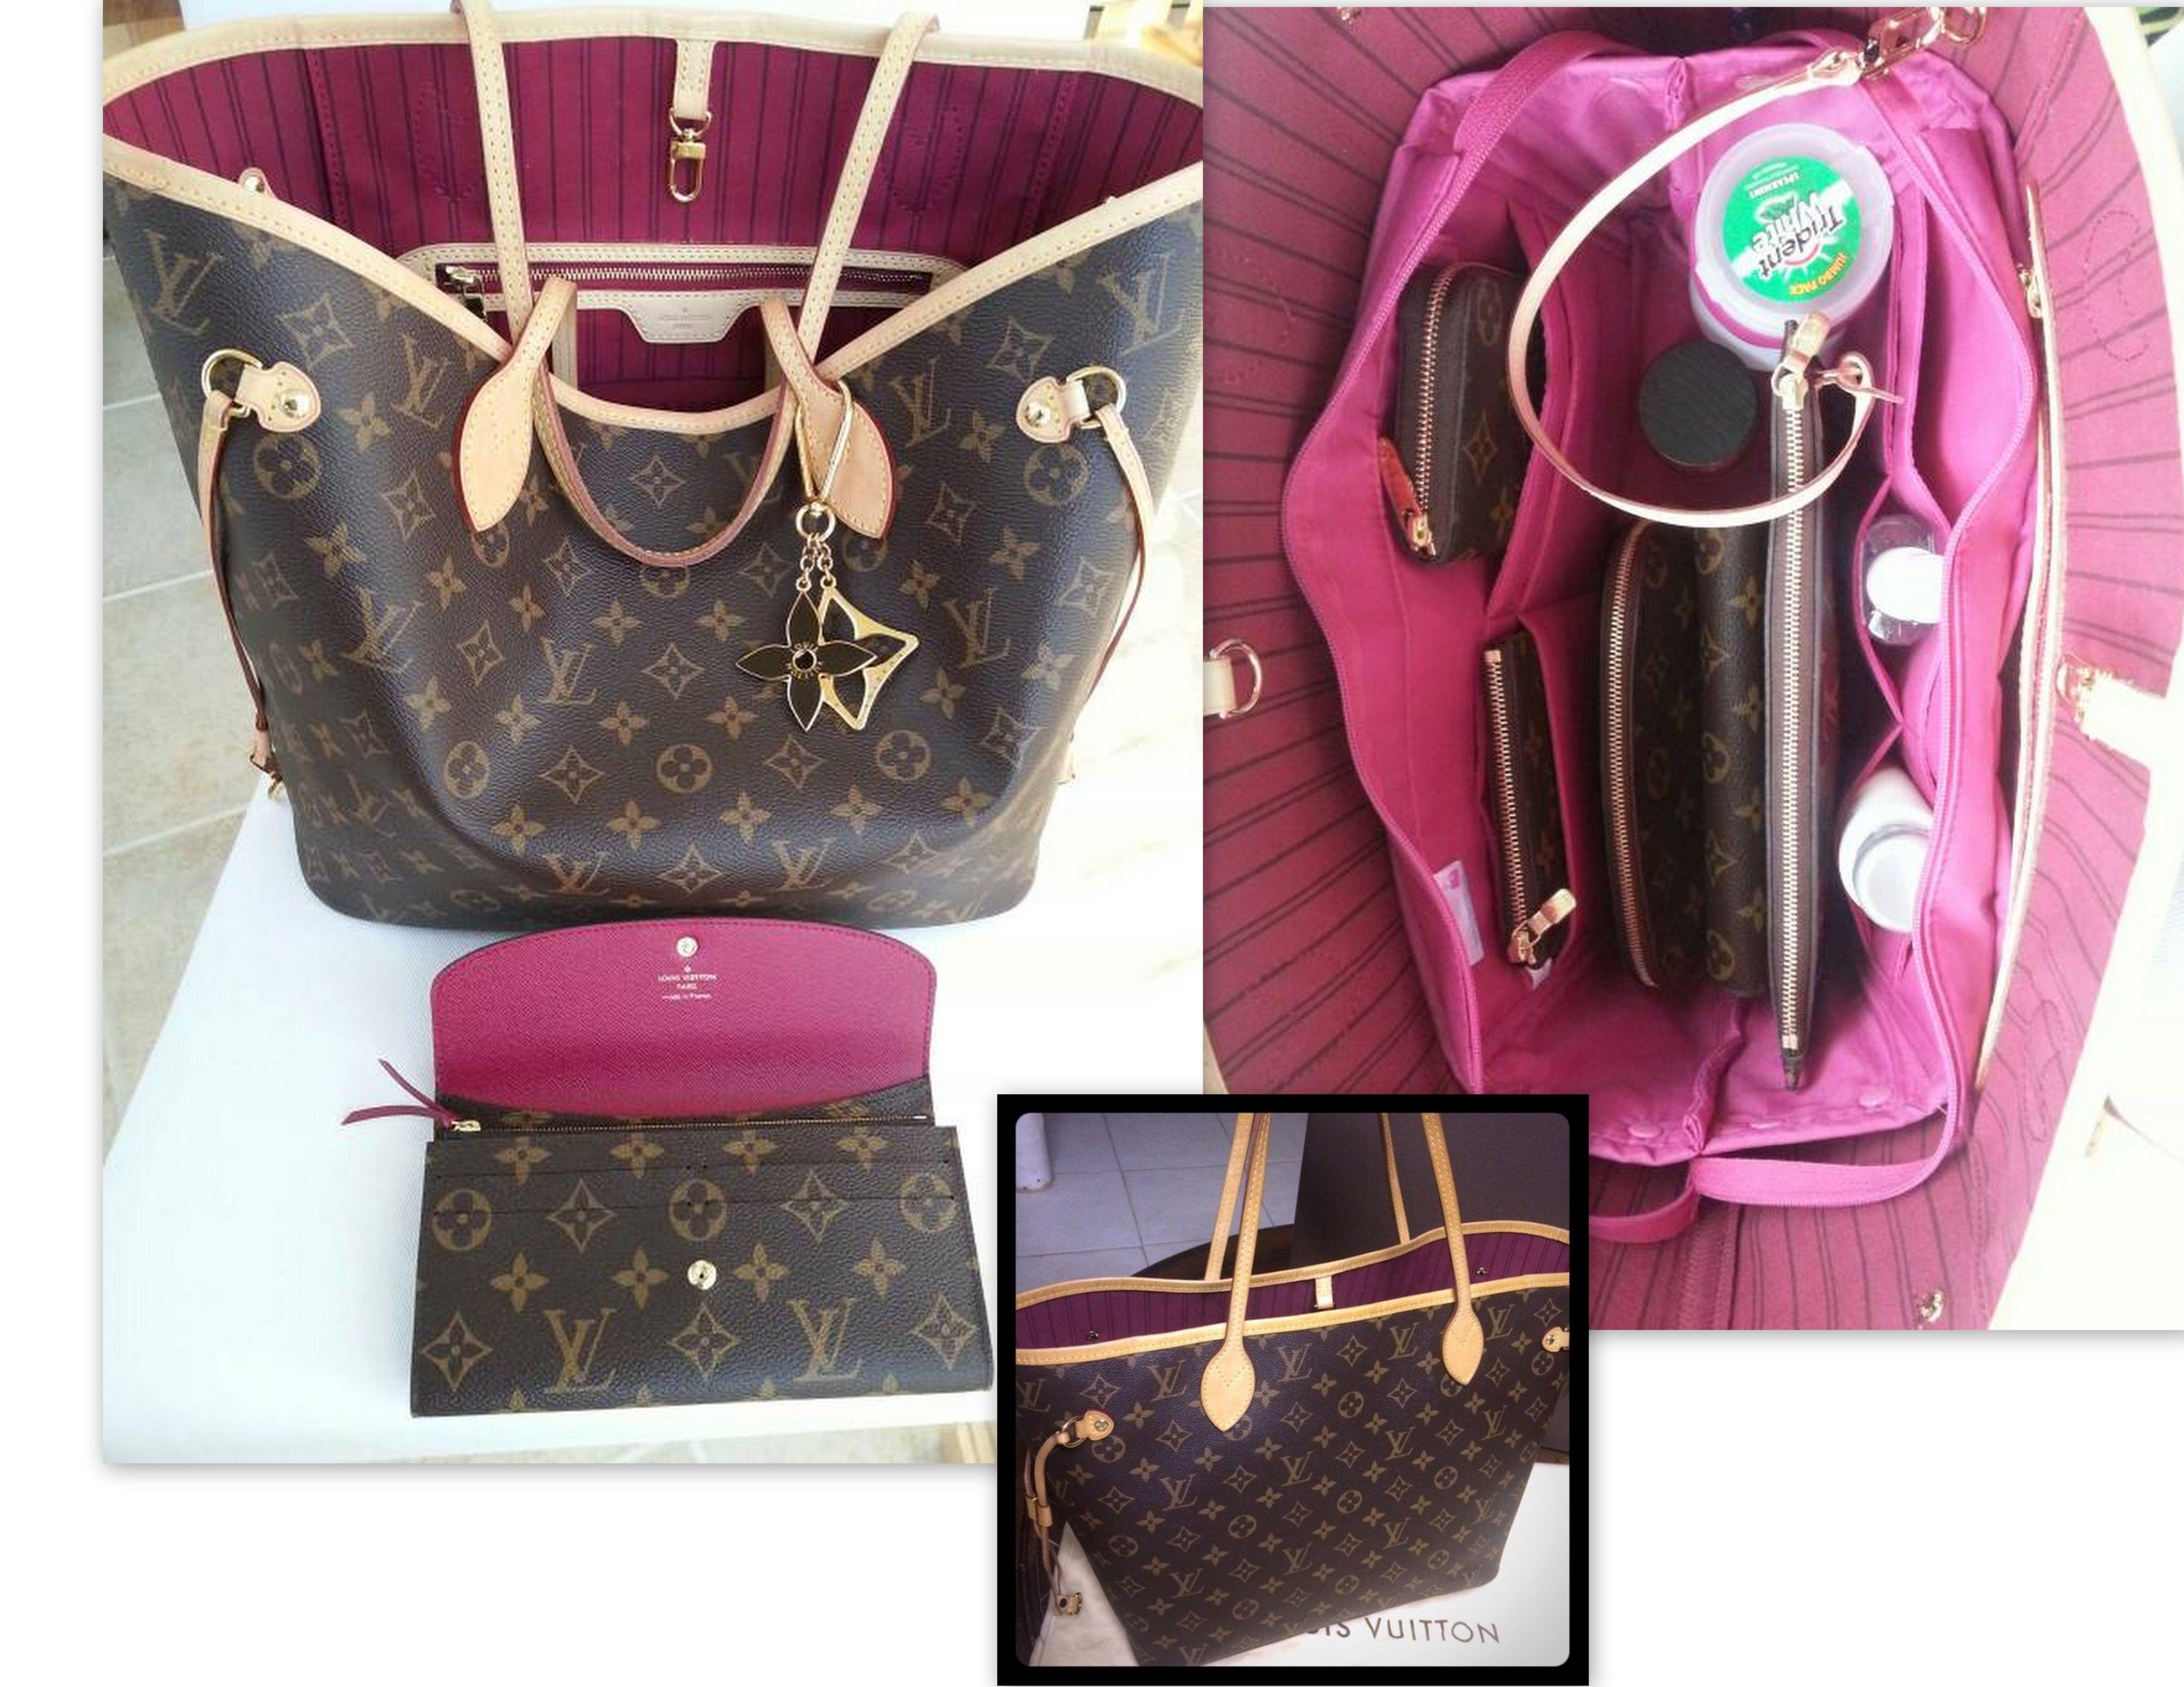 7358f6200c20 Louis Vuitton Neverfull MM Shoulder Monogram Bag louis vuitton neverfull mm  fuschia interior Louis Vuitton Neverfull